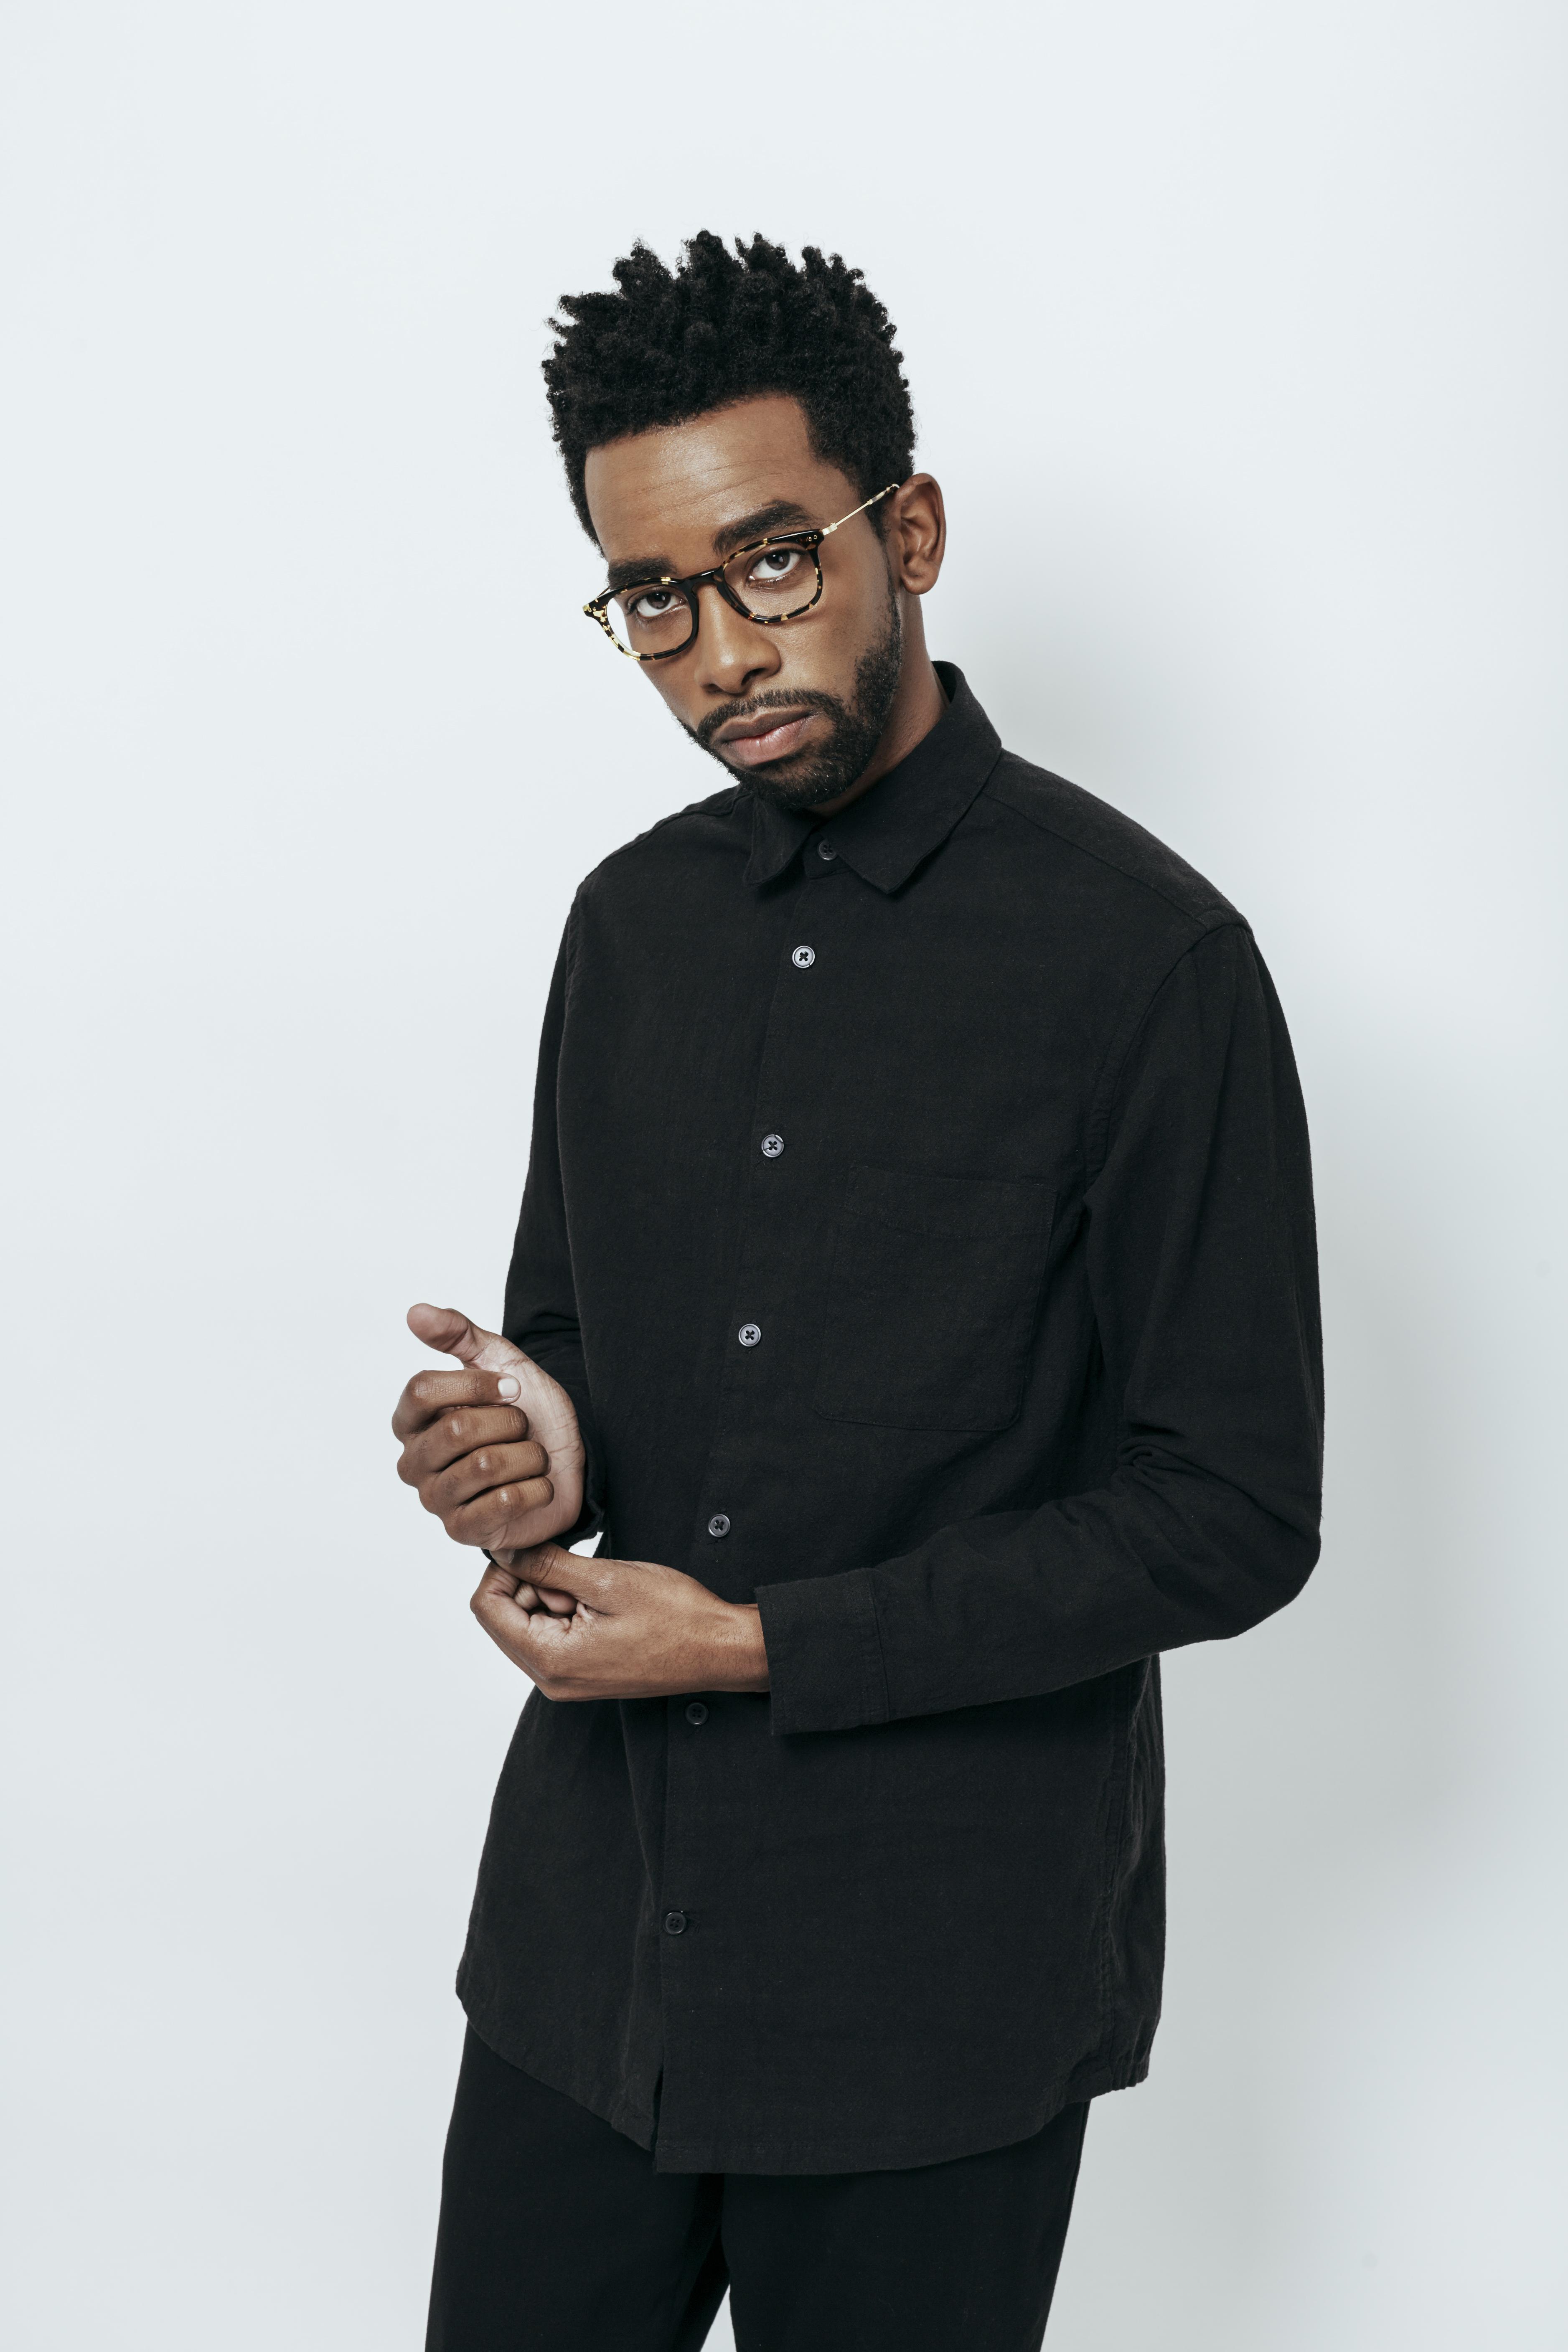 Just frames for glasses - A Man Wears Black Glasses